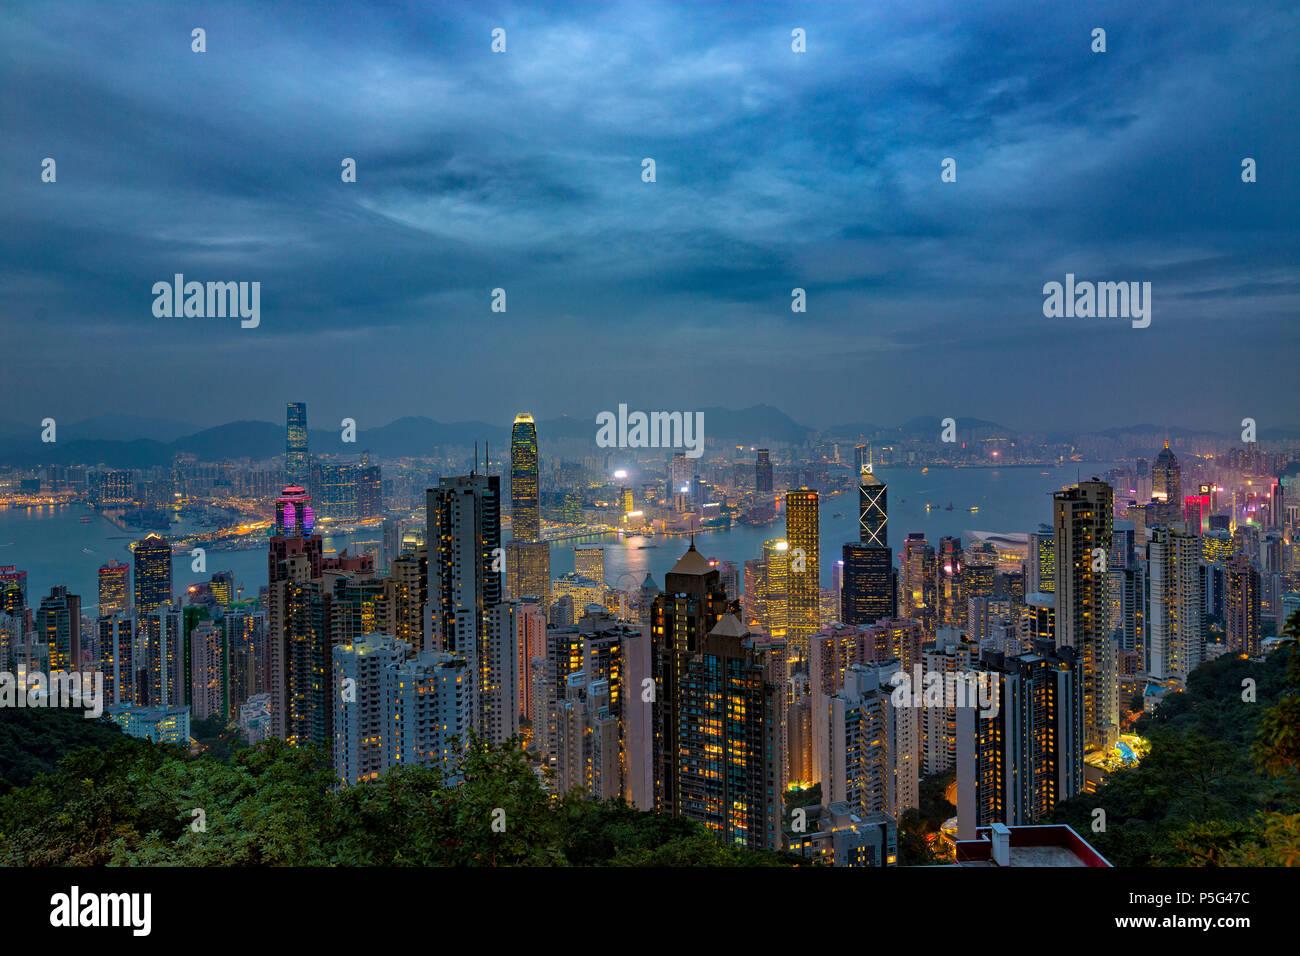 HONG KONG - NOV 6: Neon lights of Hong Kong on November, 6, 2017. Evening skyline from The Peak Stock Photo